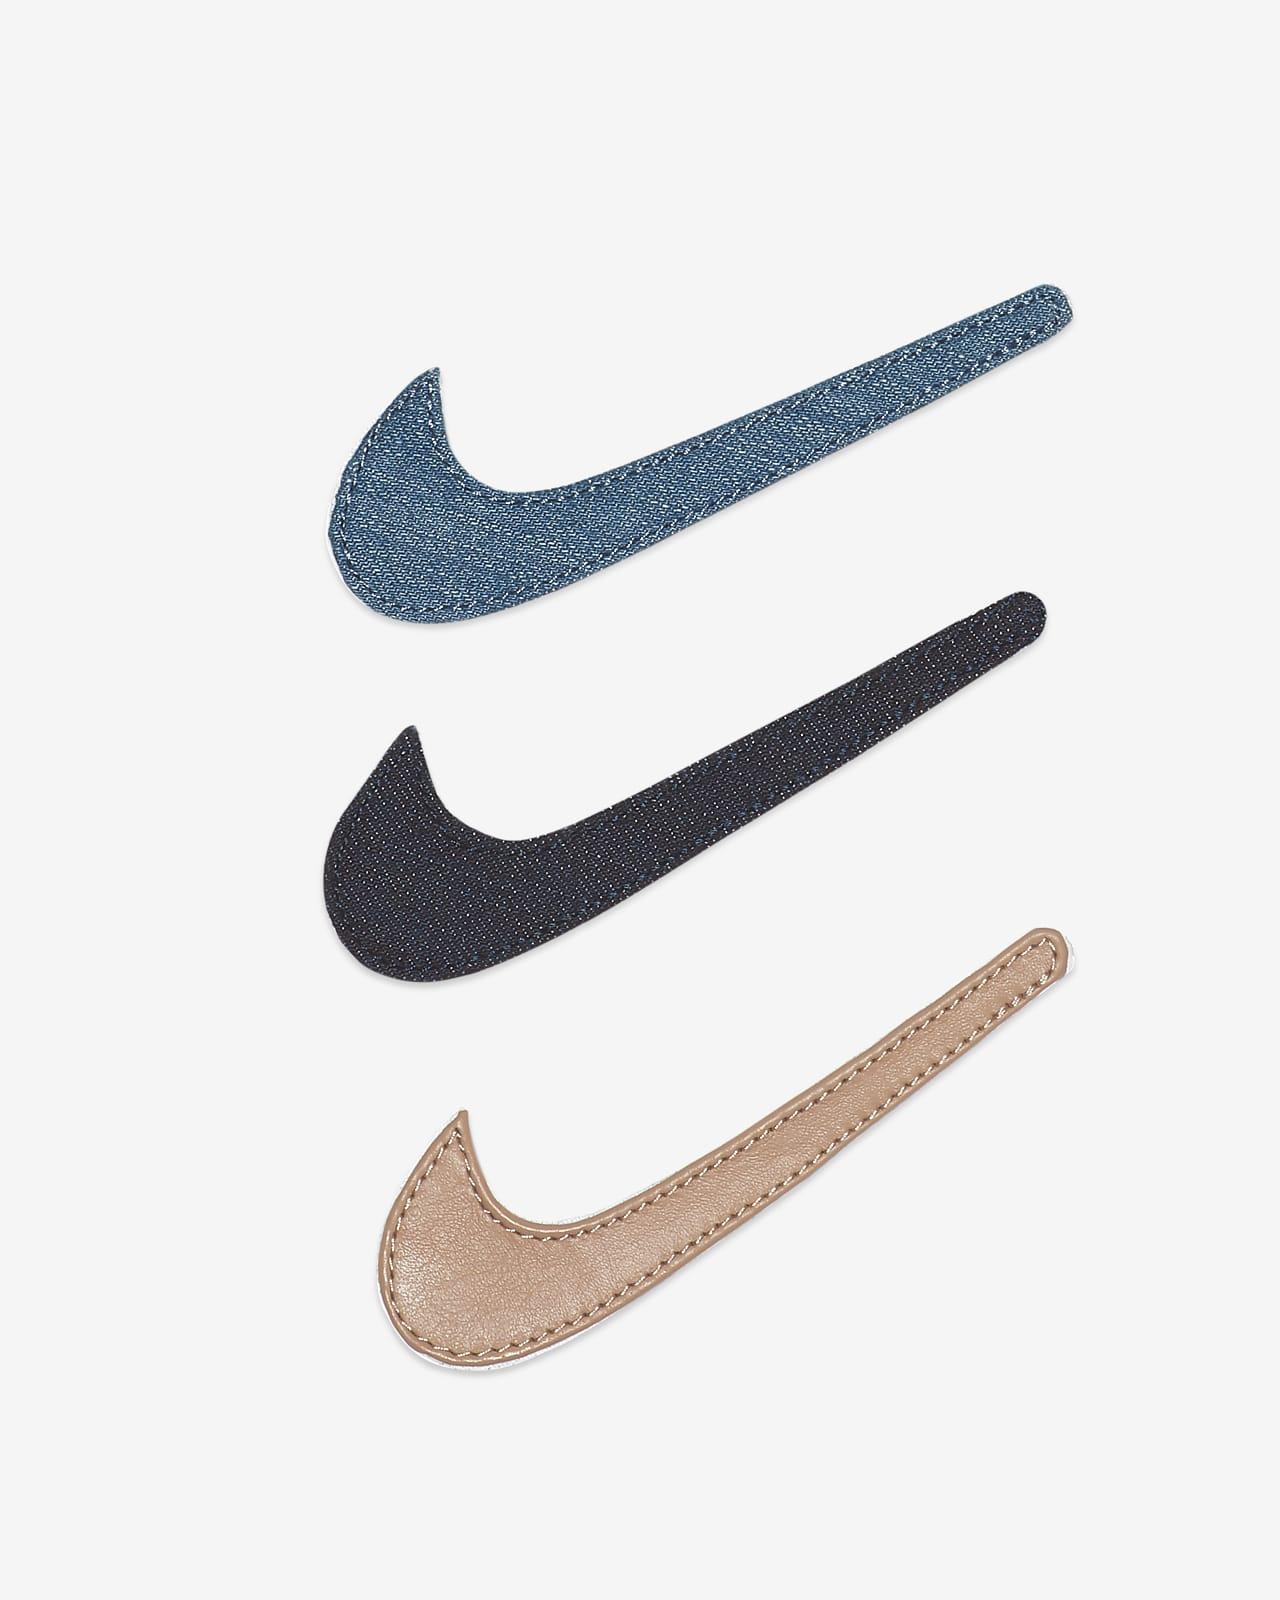 Nike Air Force 1 '07 LV8 3 Removable Swoosh Men's Shoe